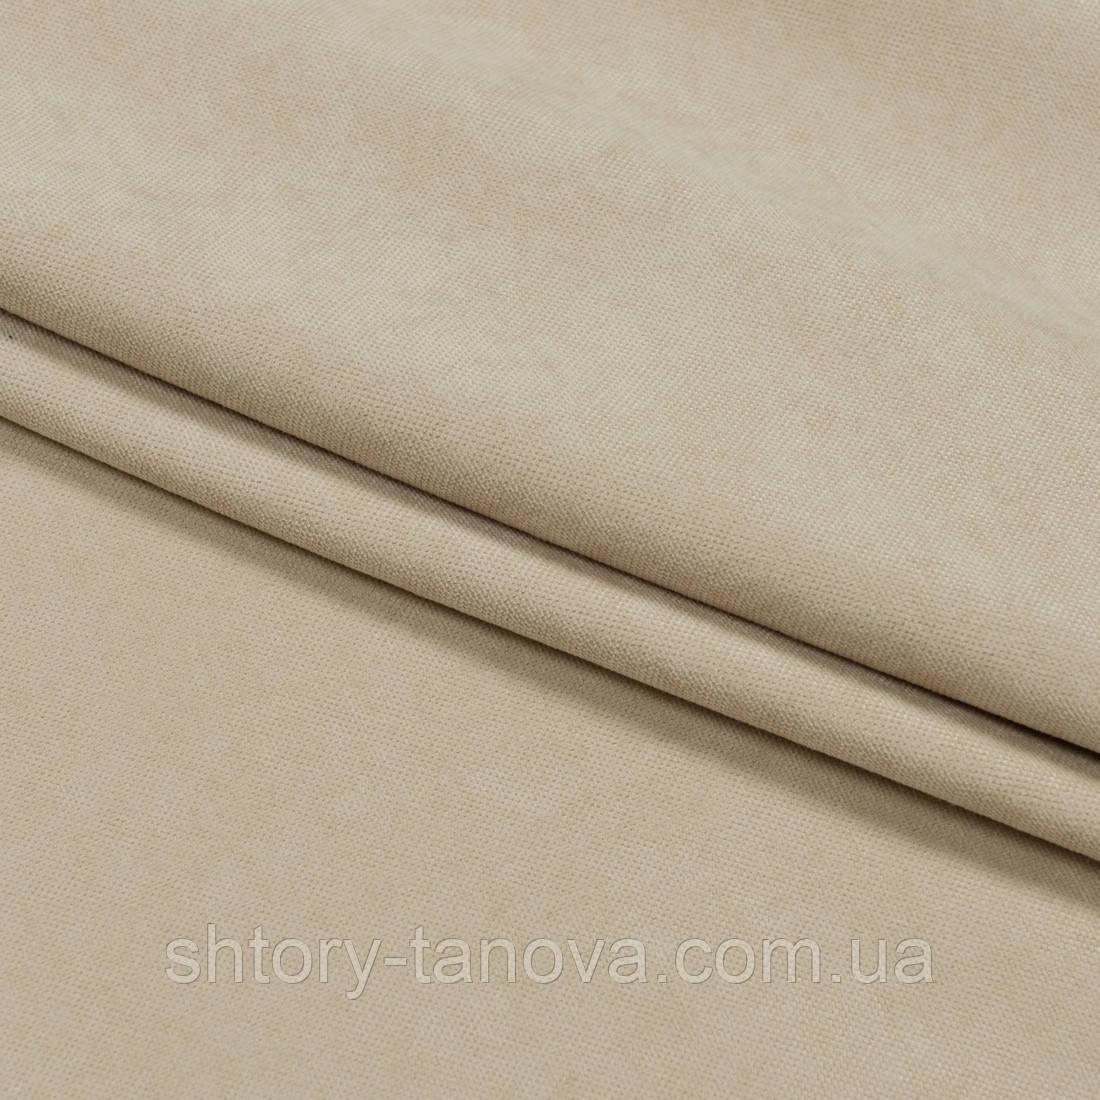 Нубук тканина для штор св. беж